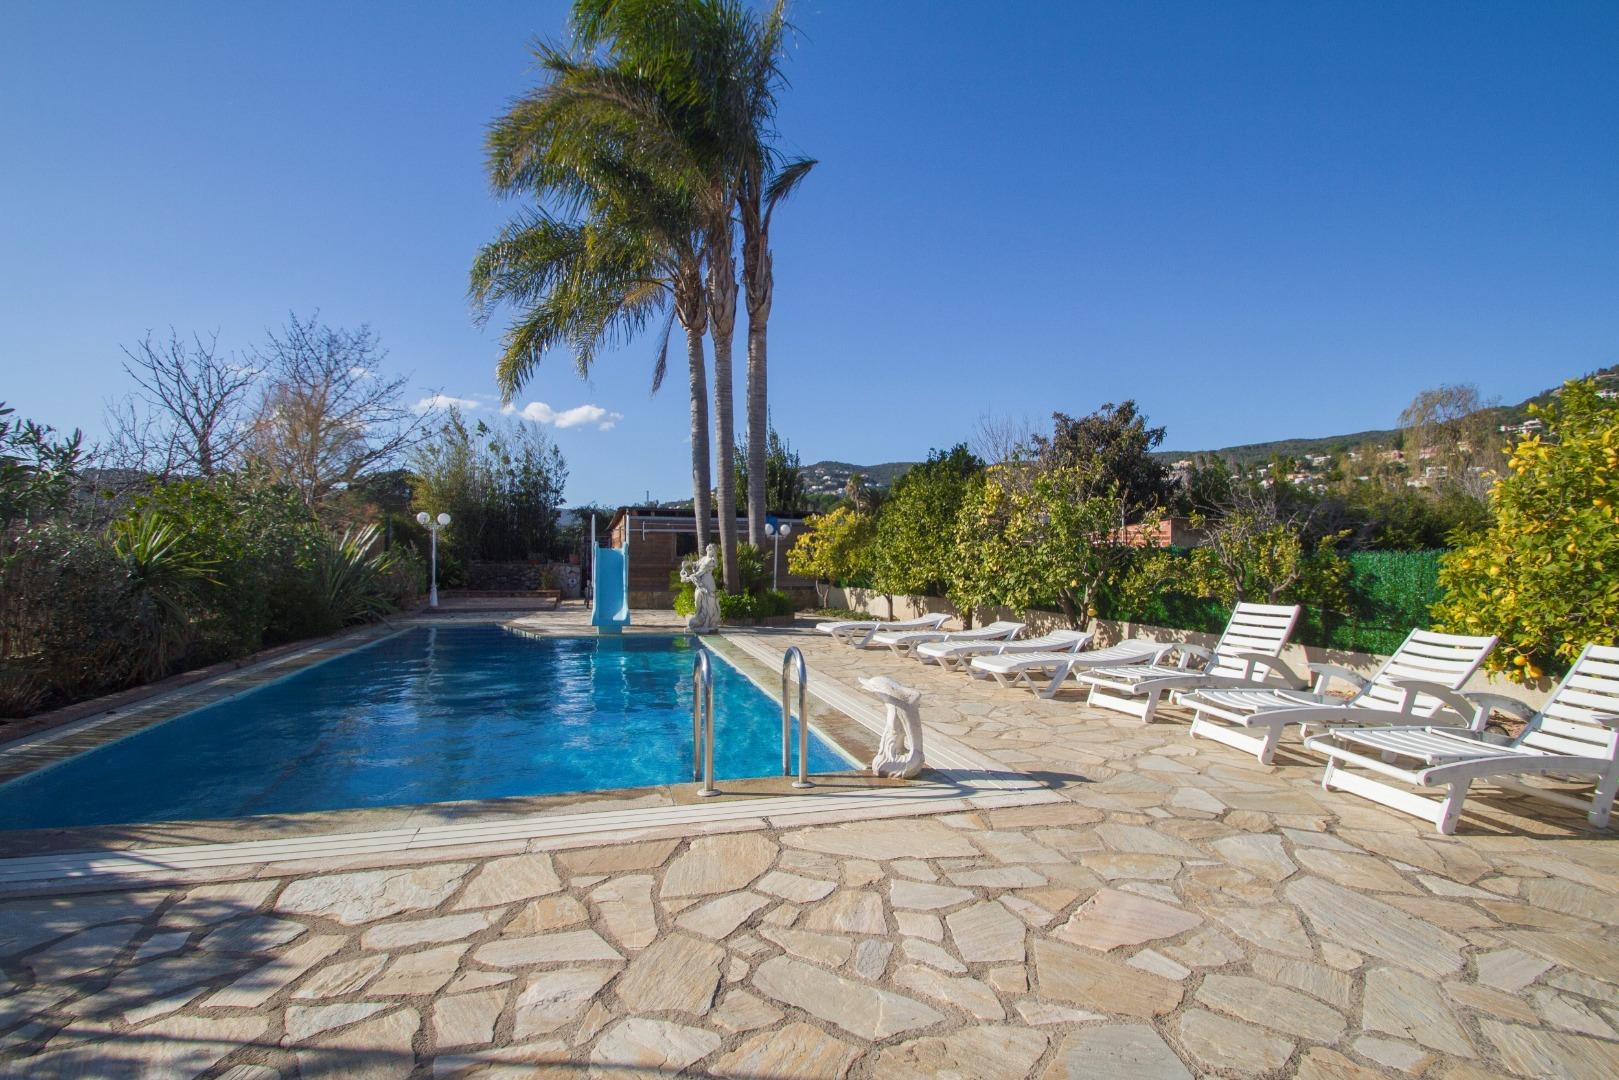 Villa Rustic Calonge,Calonge,Costa Brava #2